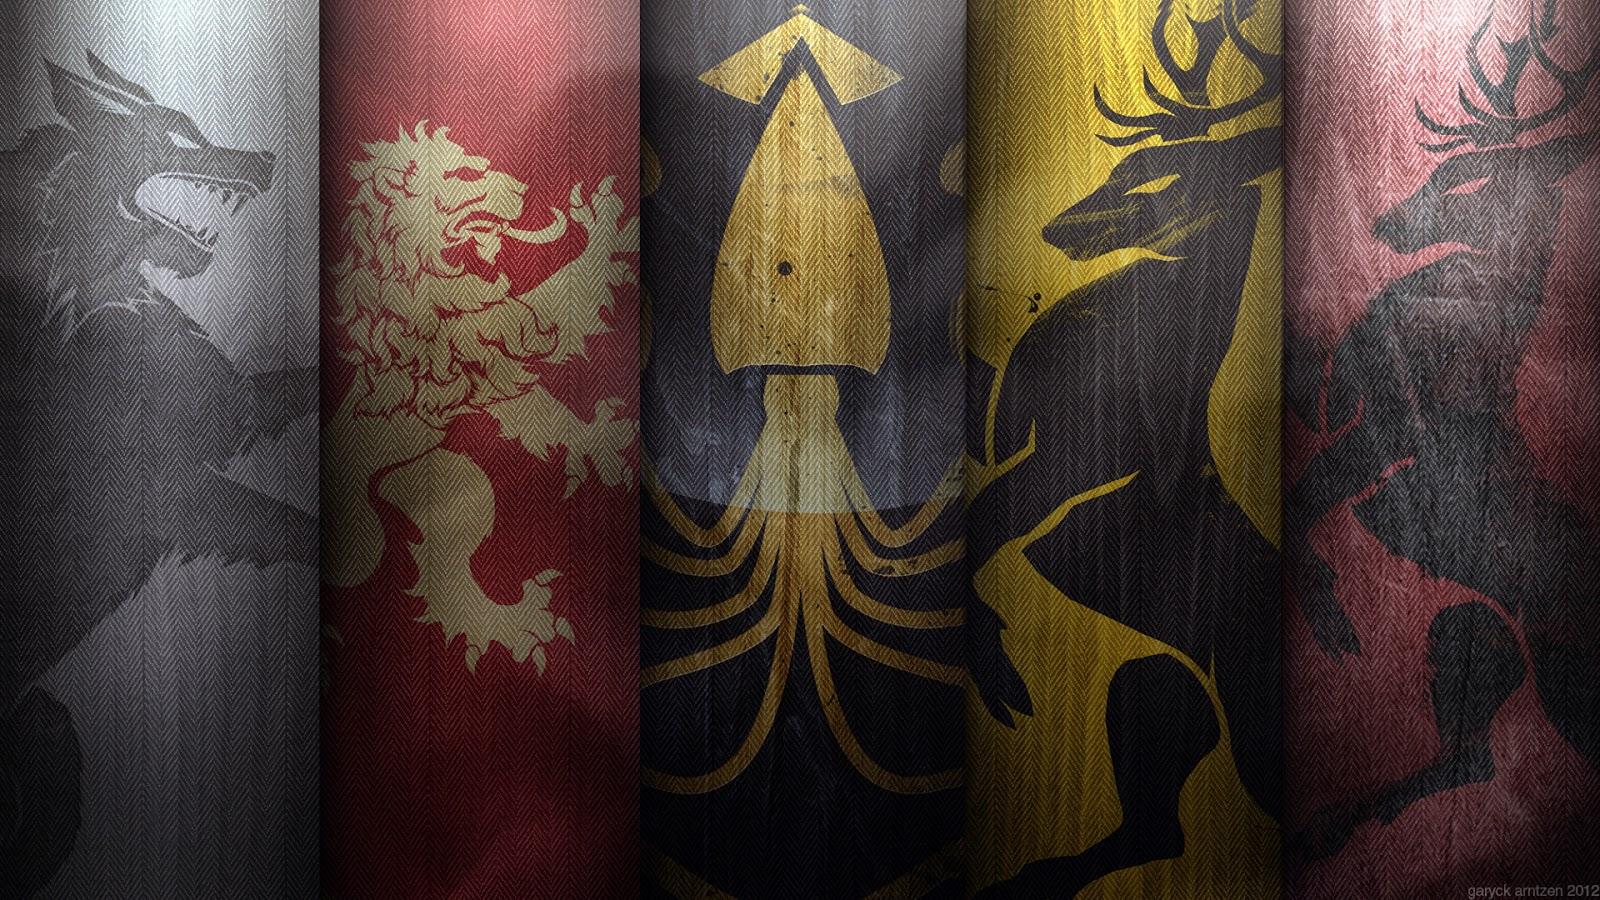 Game of thrones season 4 wallpaper subversivo58 game of thrones 4 via torrent game of thrones season 4 wallpaper voltagebd Images